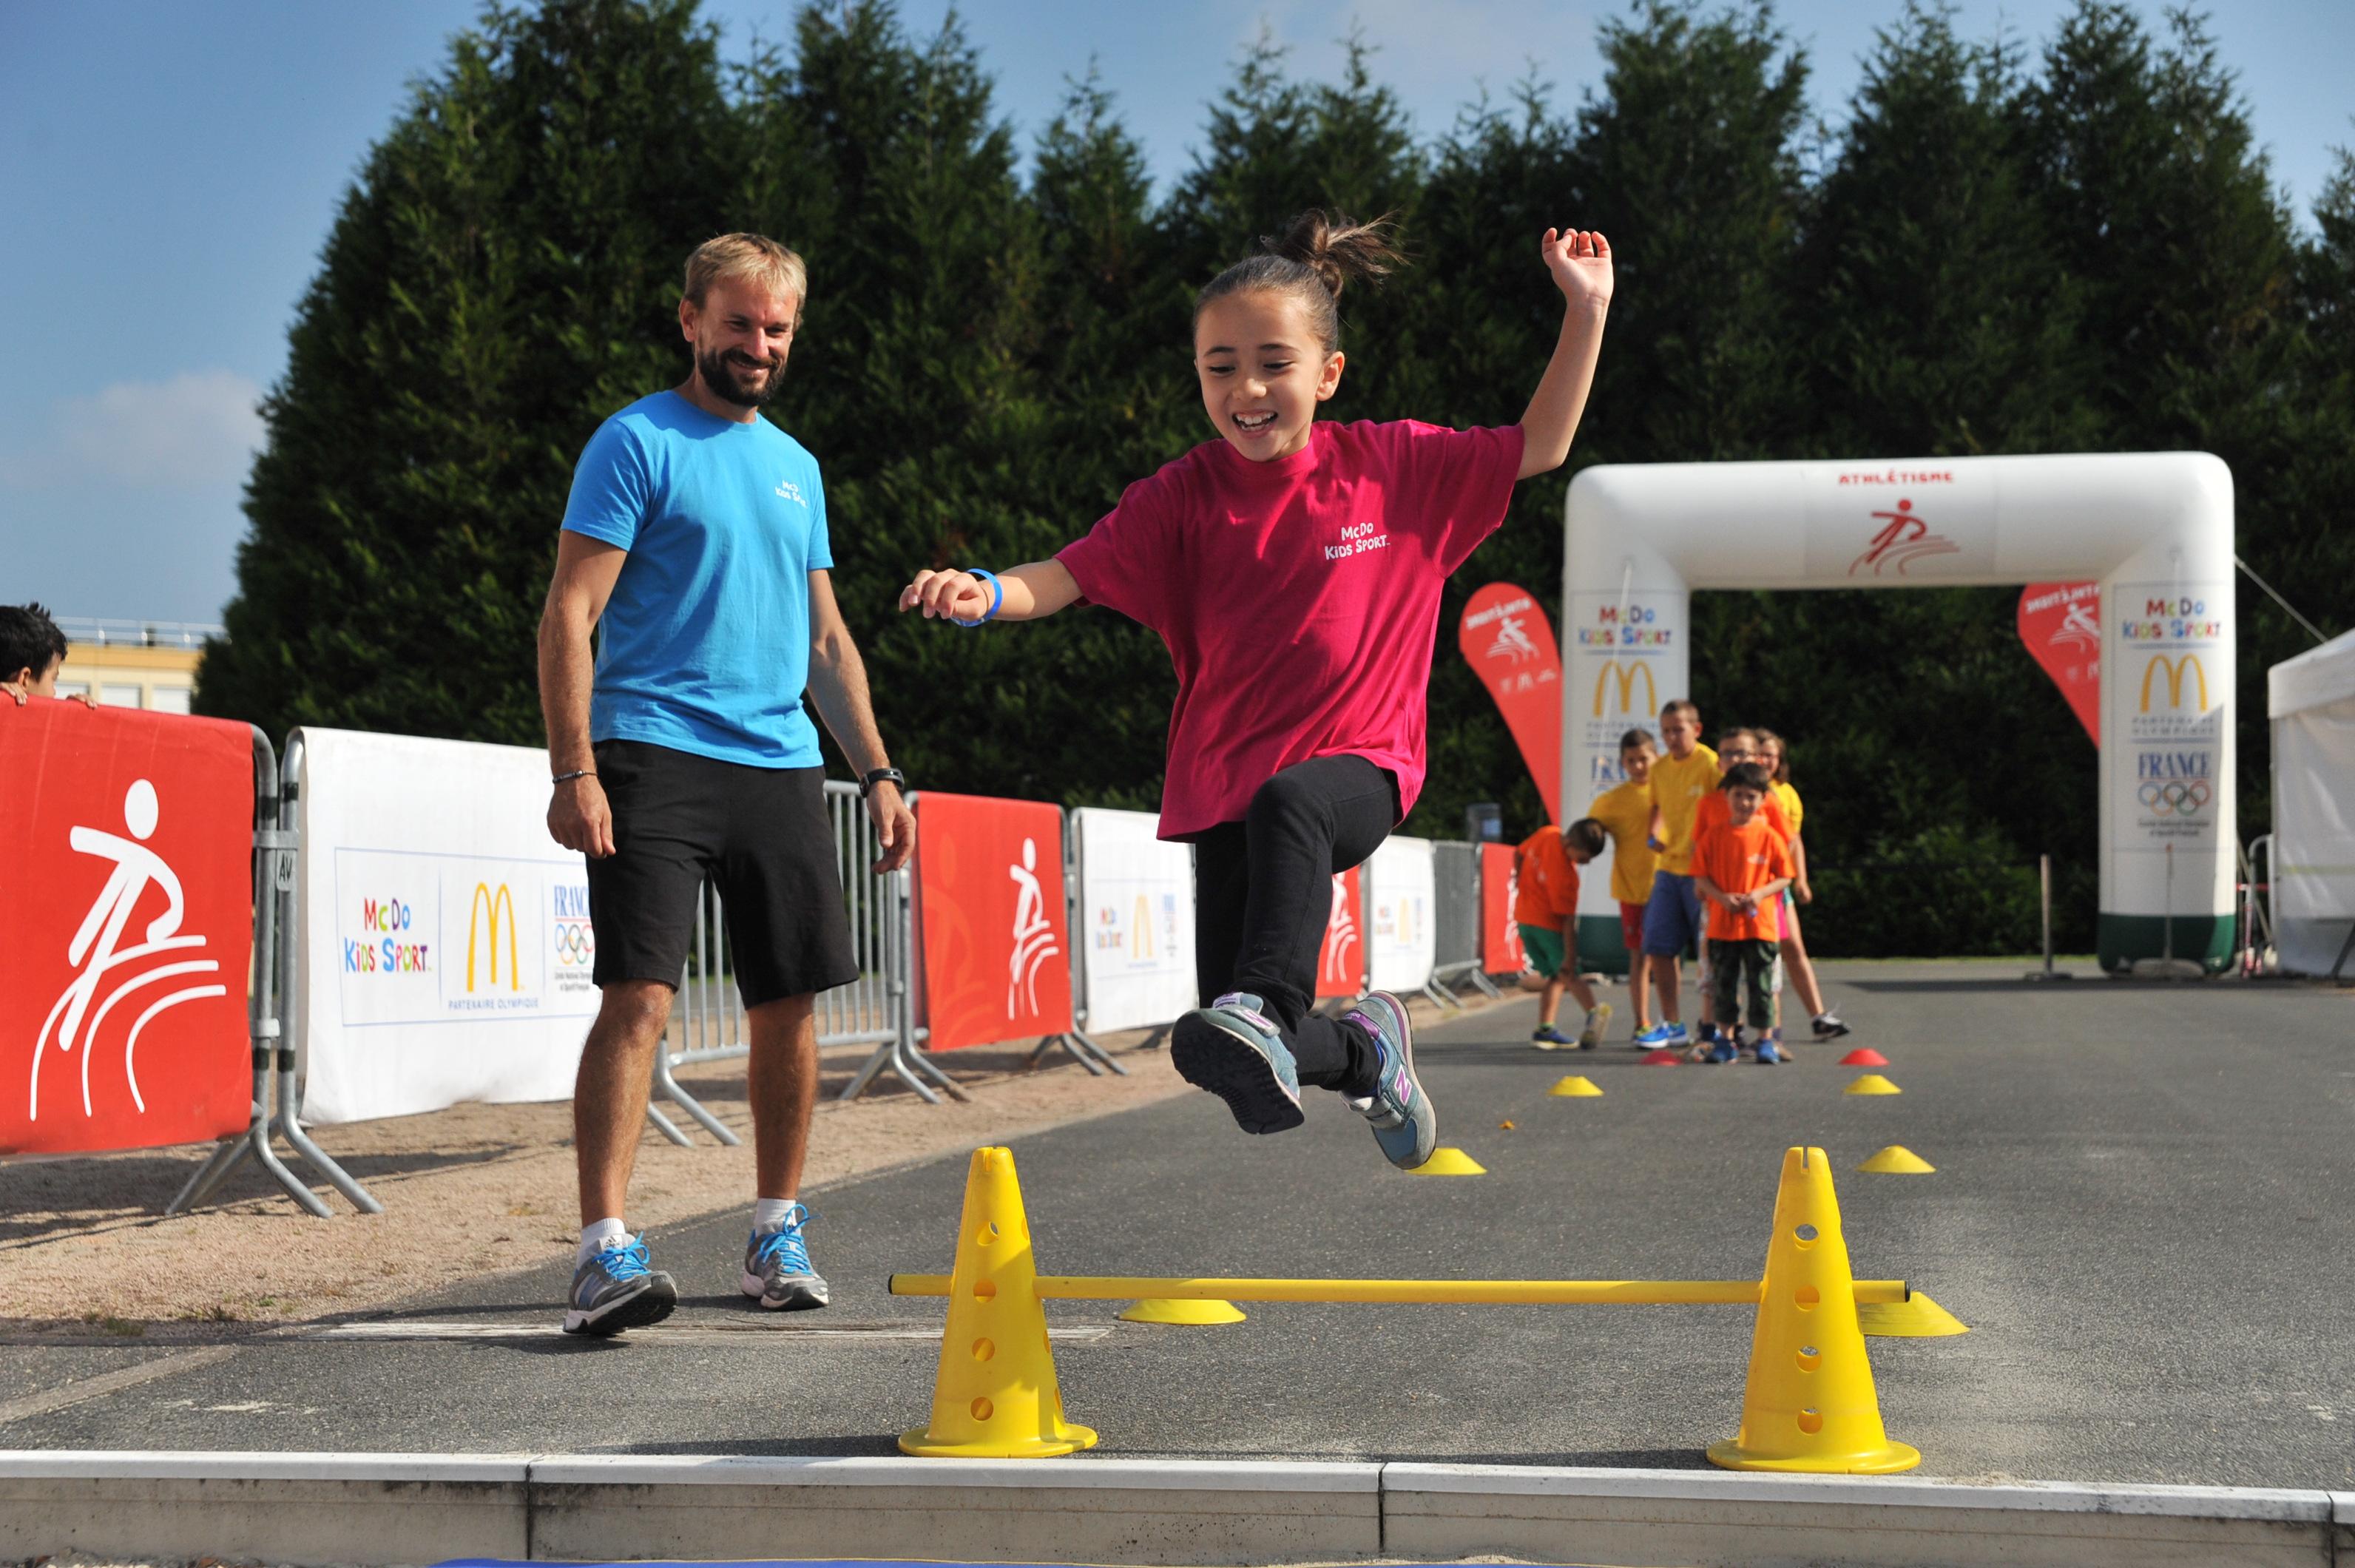 "Aulnay-sous-Bois accueille le village ""McDo Kids Sport"" ce mercredi.   &Copy; CDOS Morbihan"